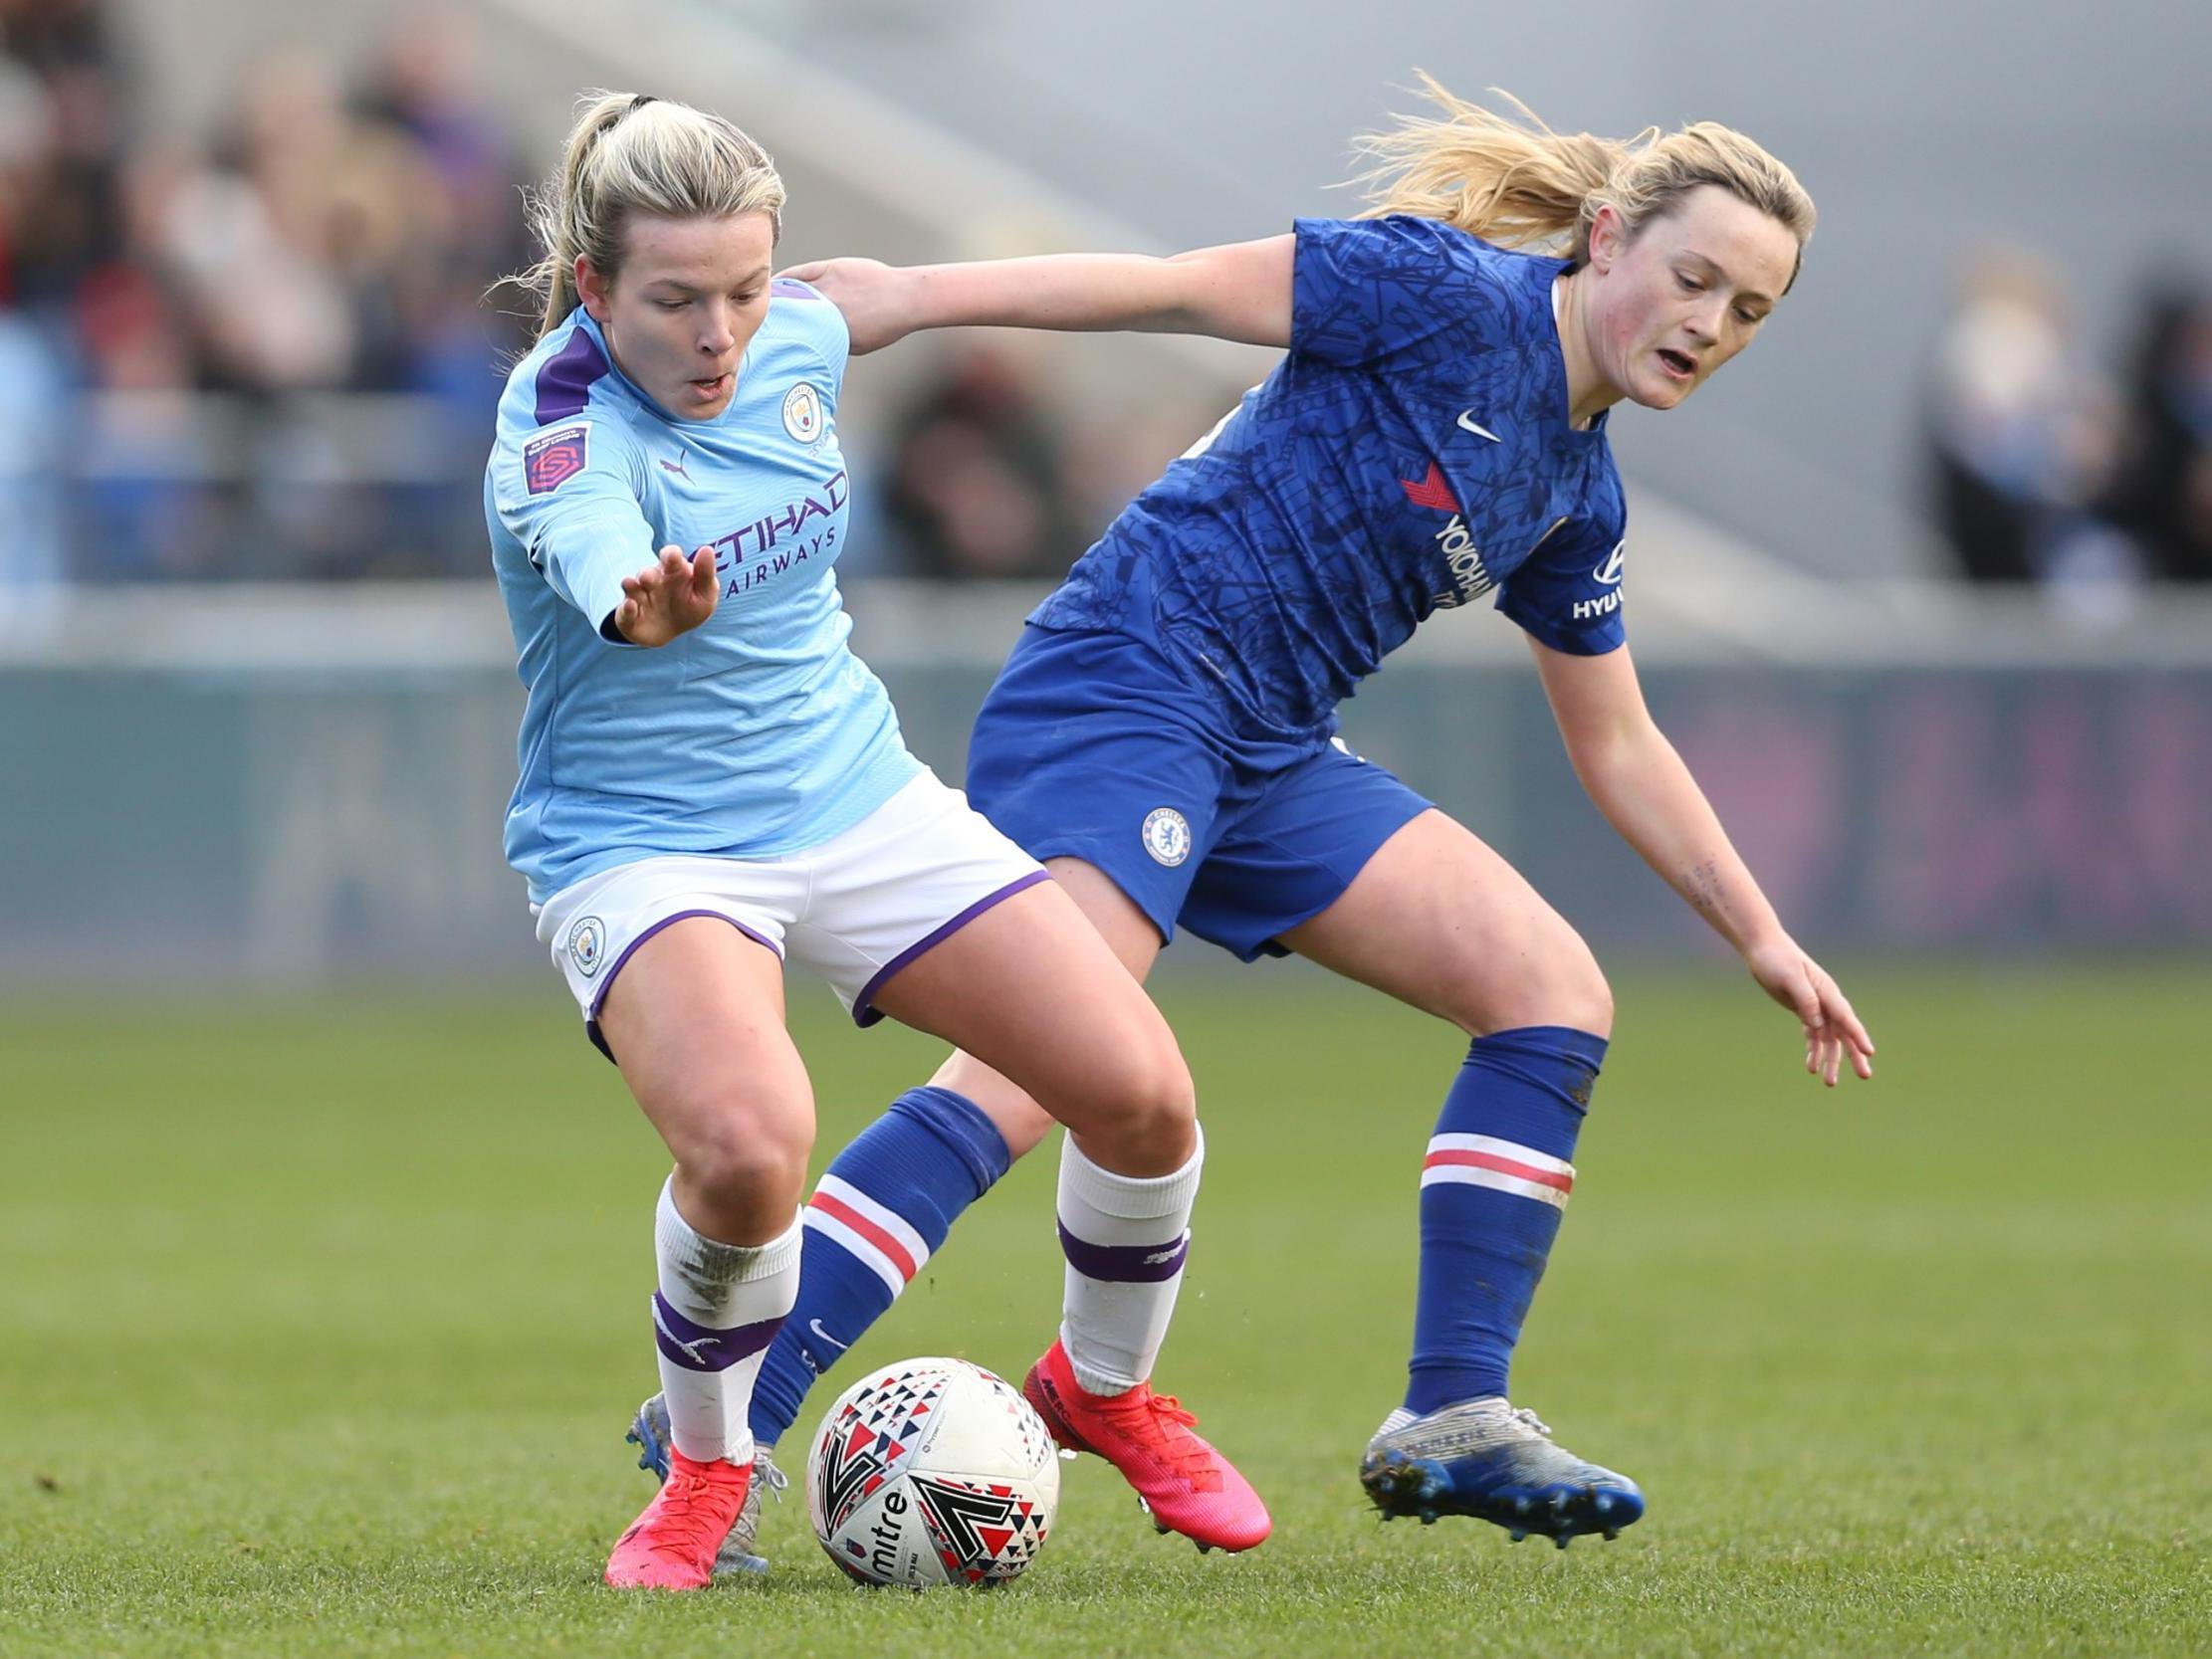 Women's Super League season cancelled by Football Association